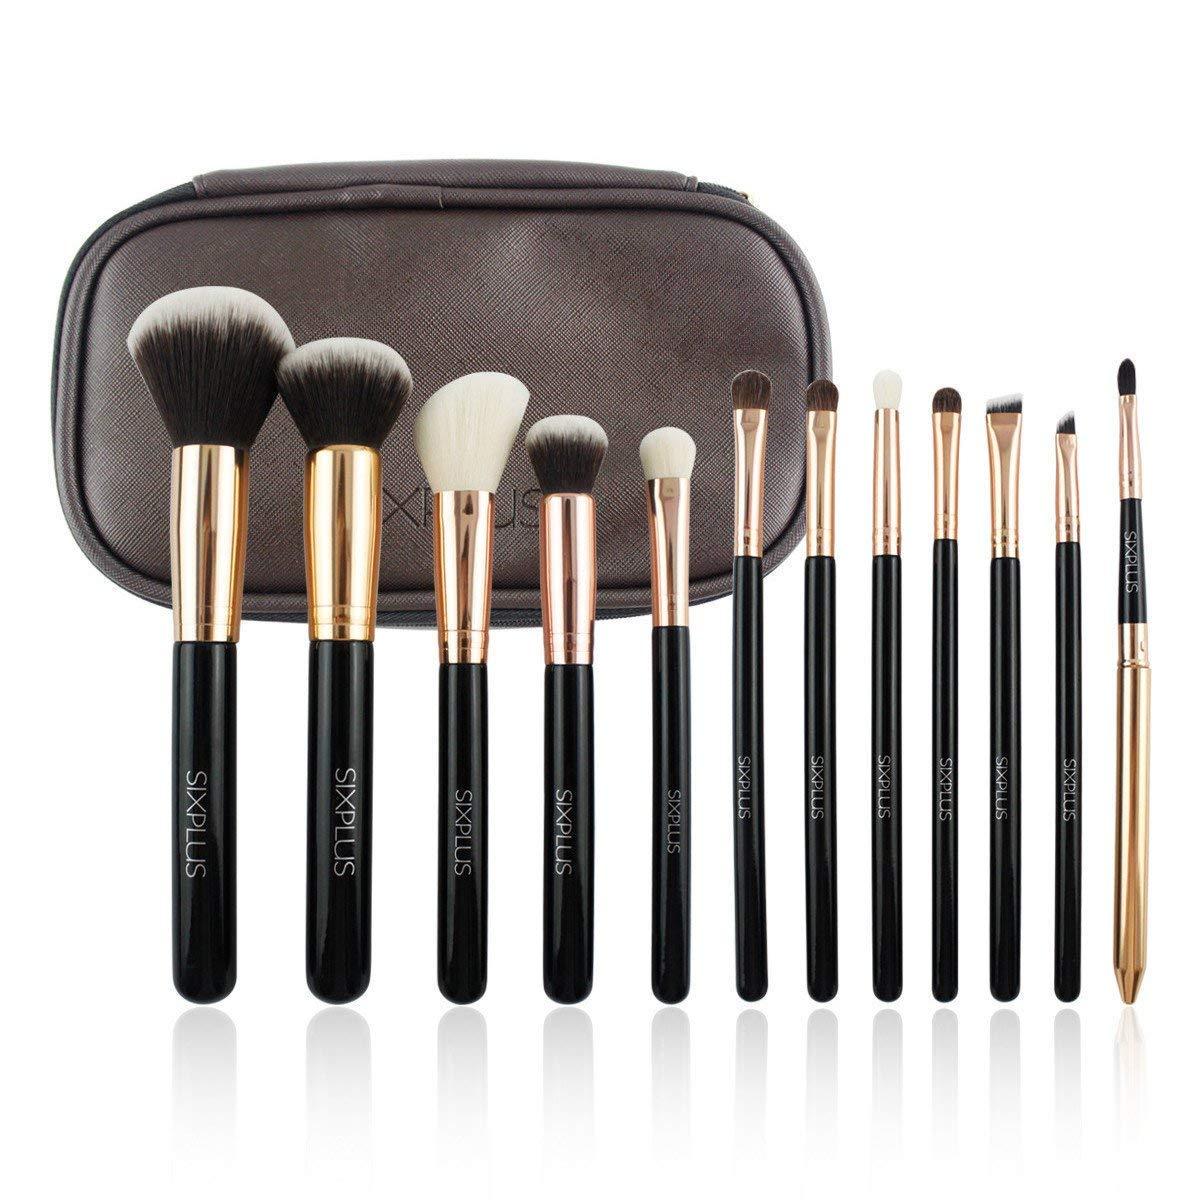 SIXPLUS 12pcs Professionelles Make Up Pinsel Set, Schminkpinsel, Pinselset Kosmetik, mit Große Kapazität Kosmetiktasche (Schwarz)